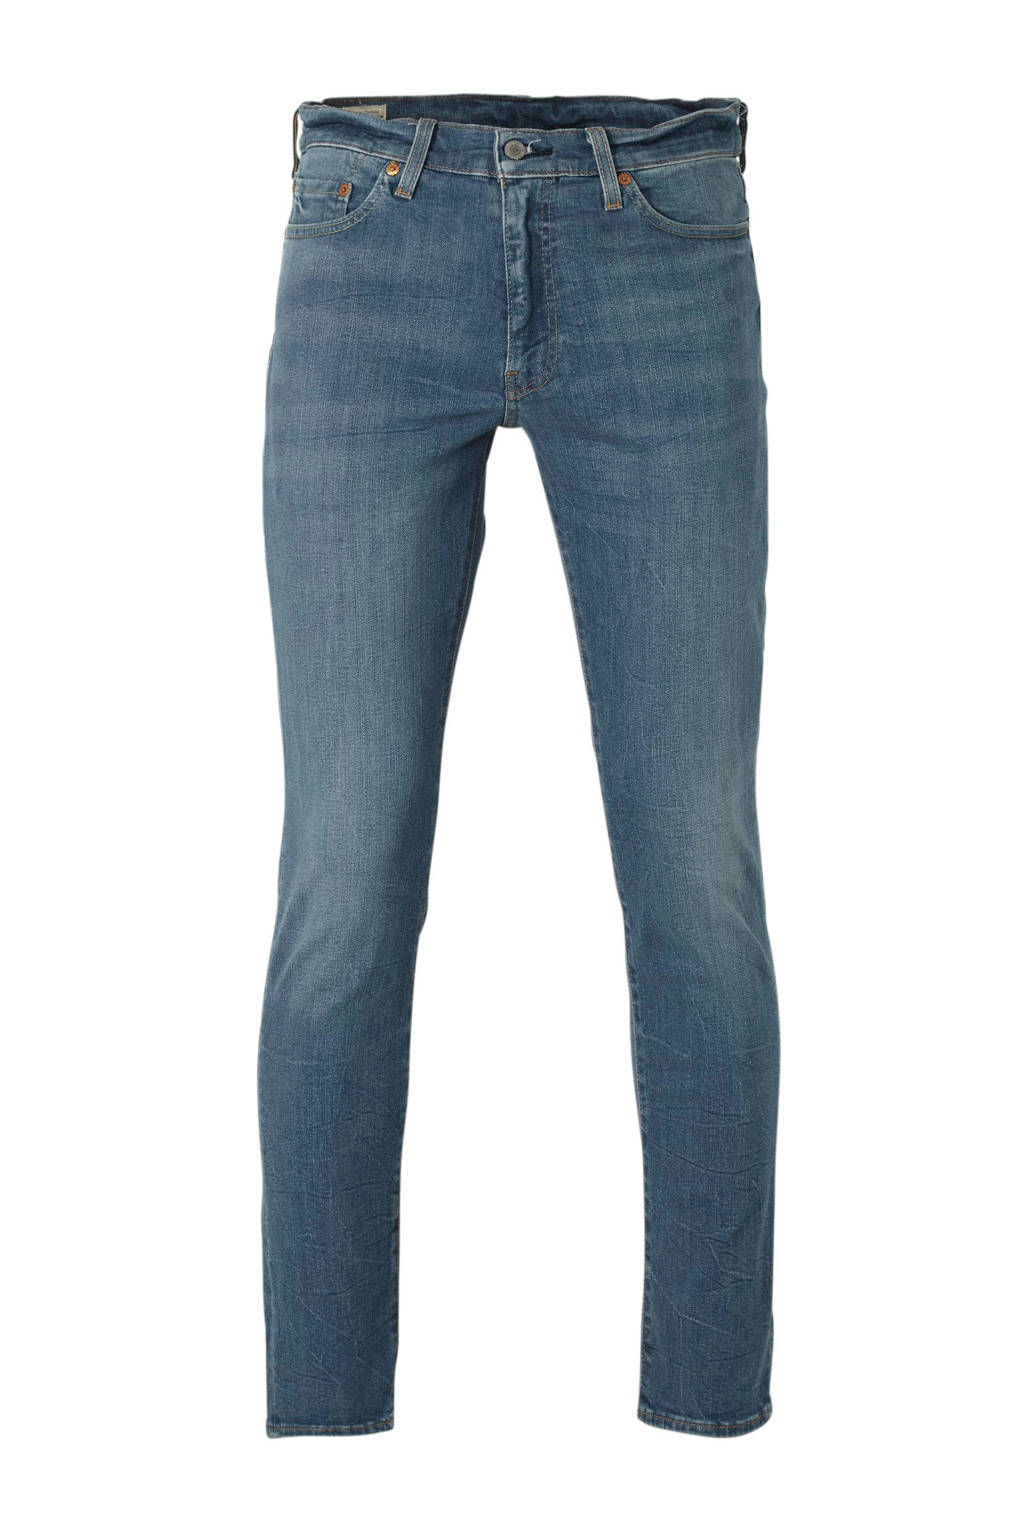 Levi's slim fit jeans 511 dublin, Dublin